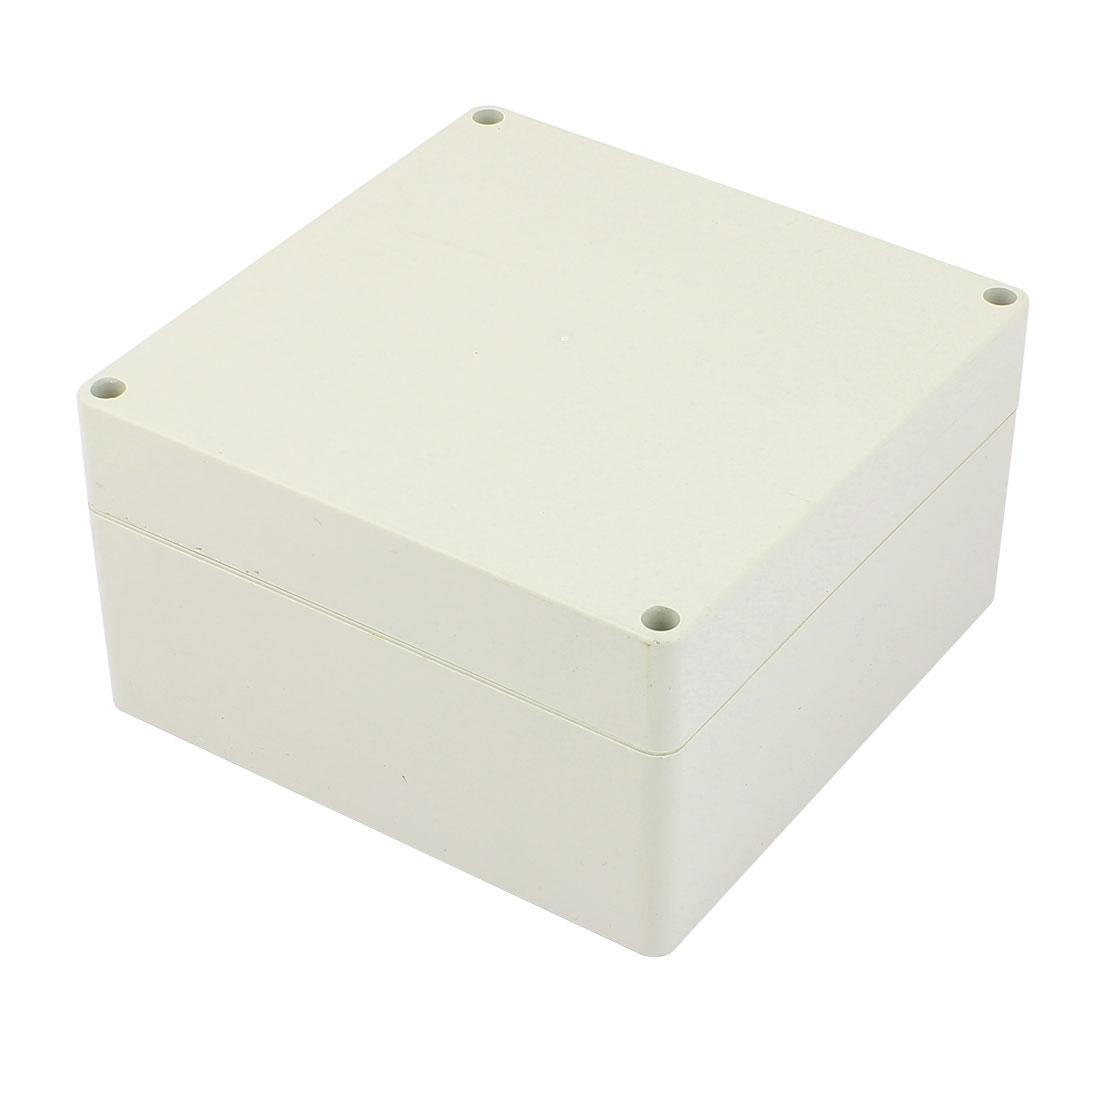 160mm x 160mm x 90mm Rectangular Dustproof IP65 Plastic DIY Junction Box Case